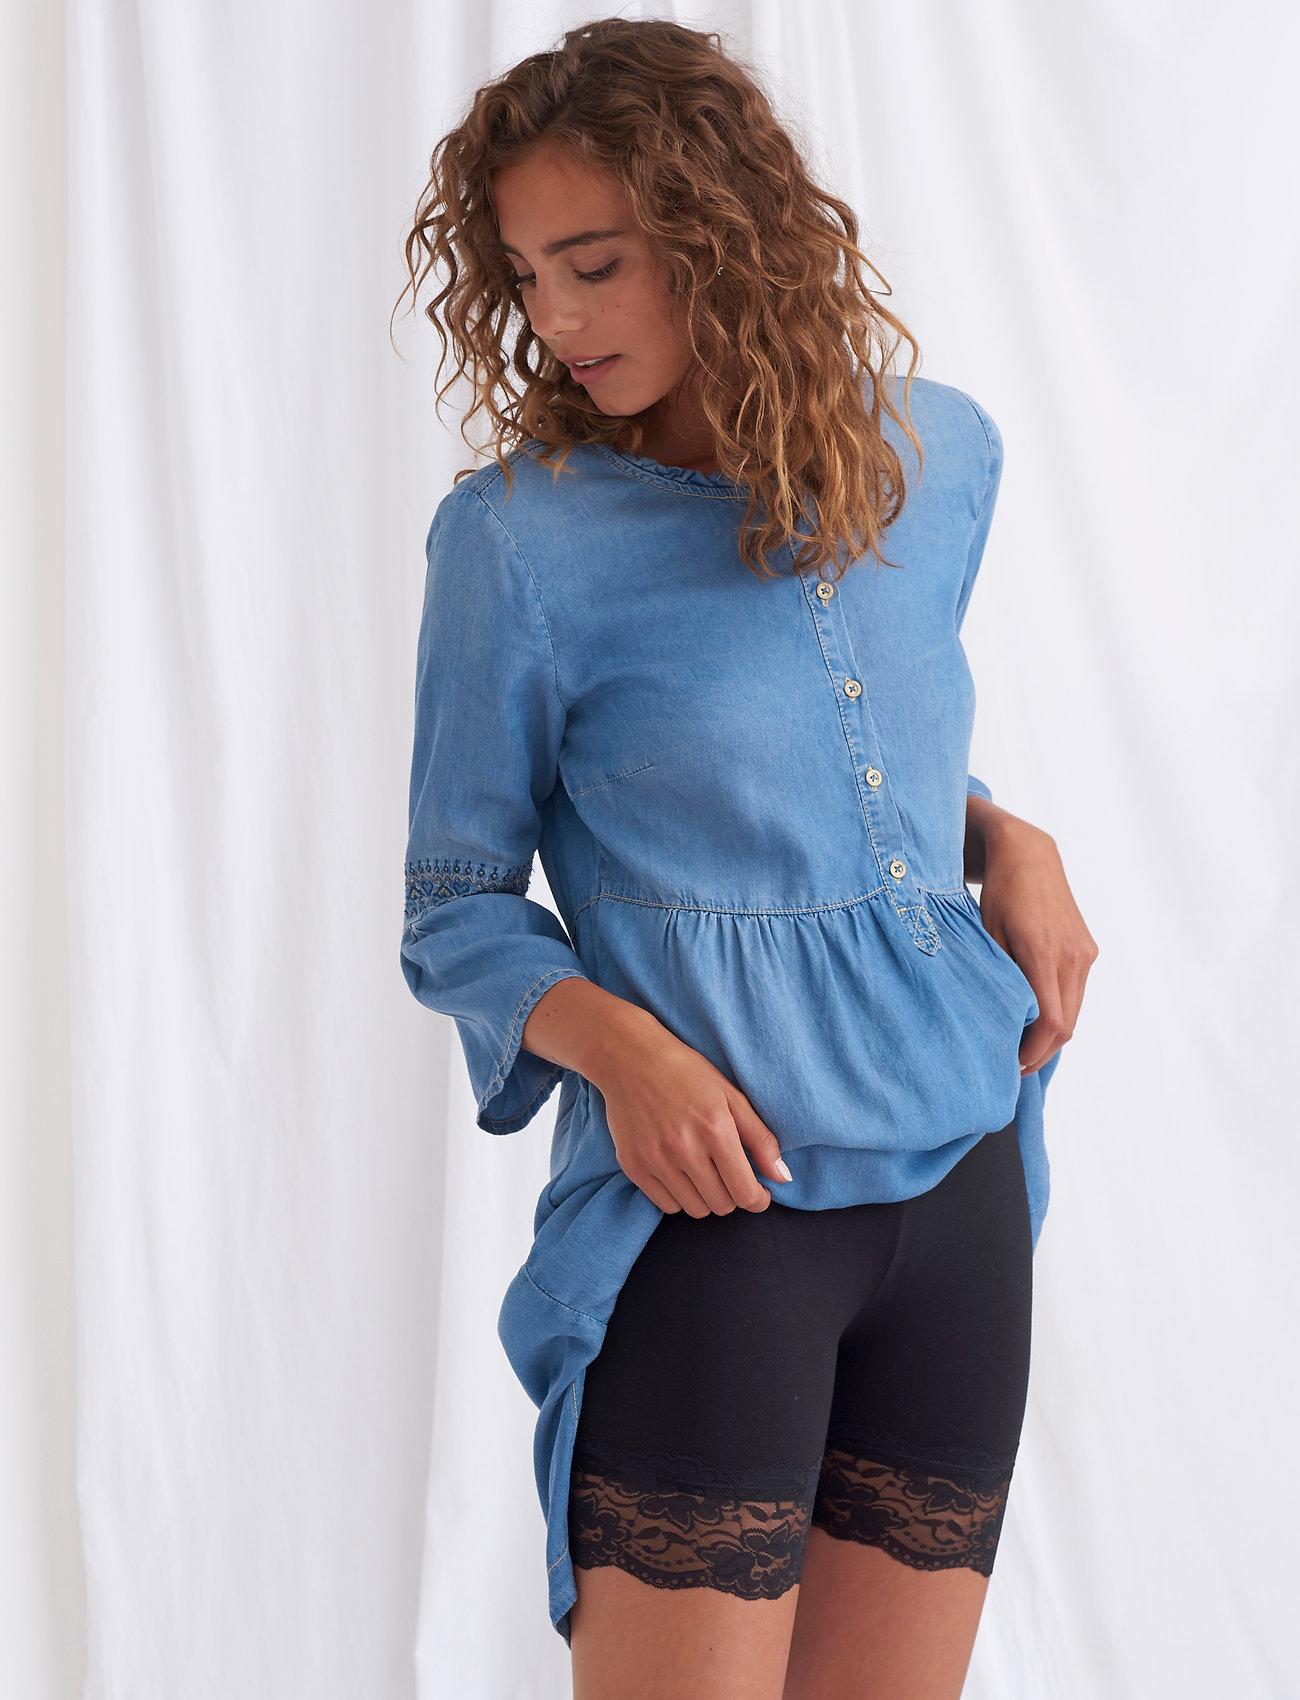 Cream - Matilda Biker Shorts - bottoms - pitch black - 0